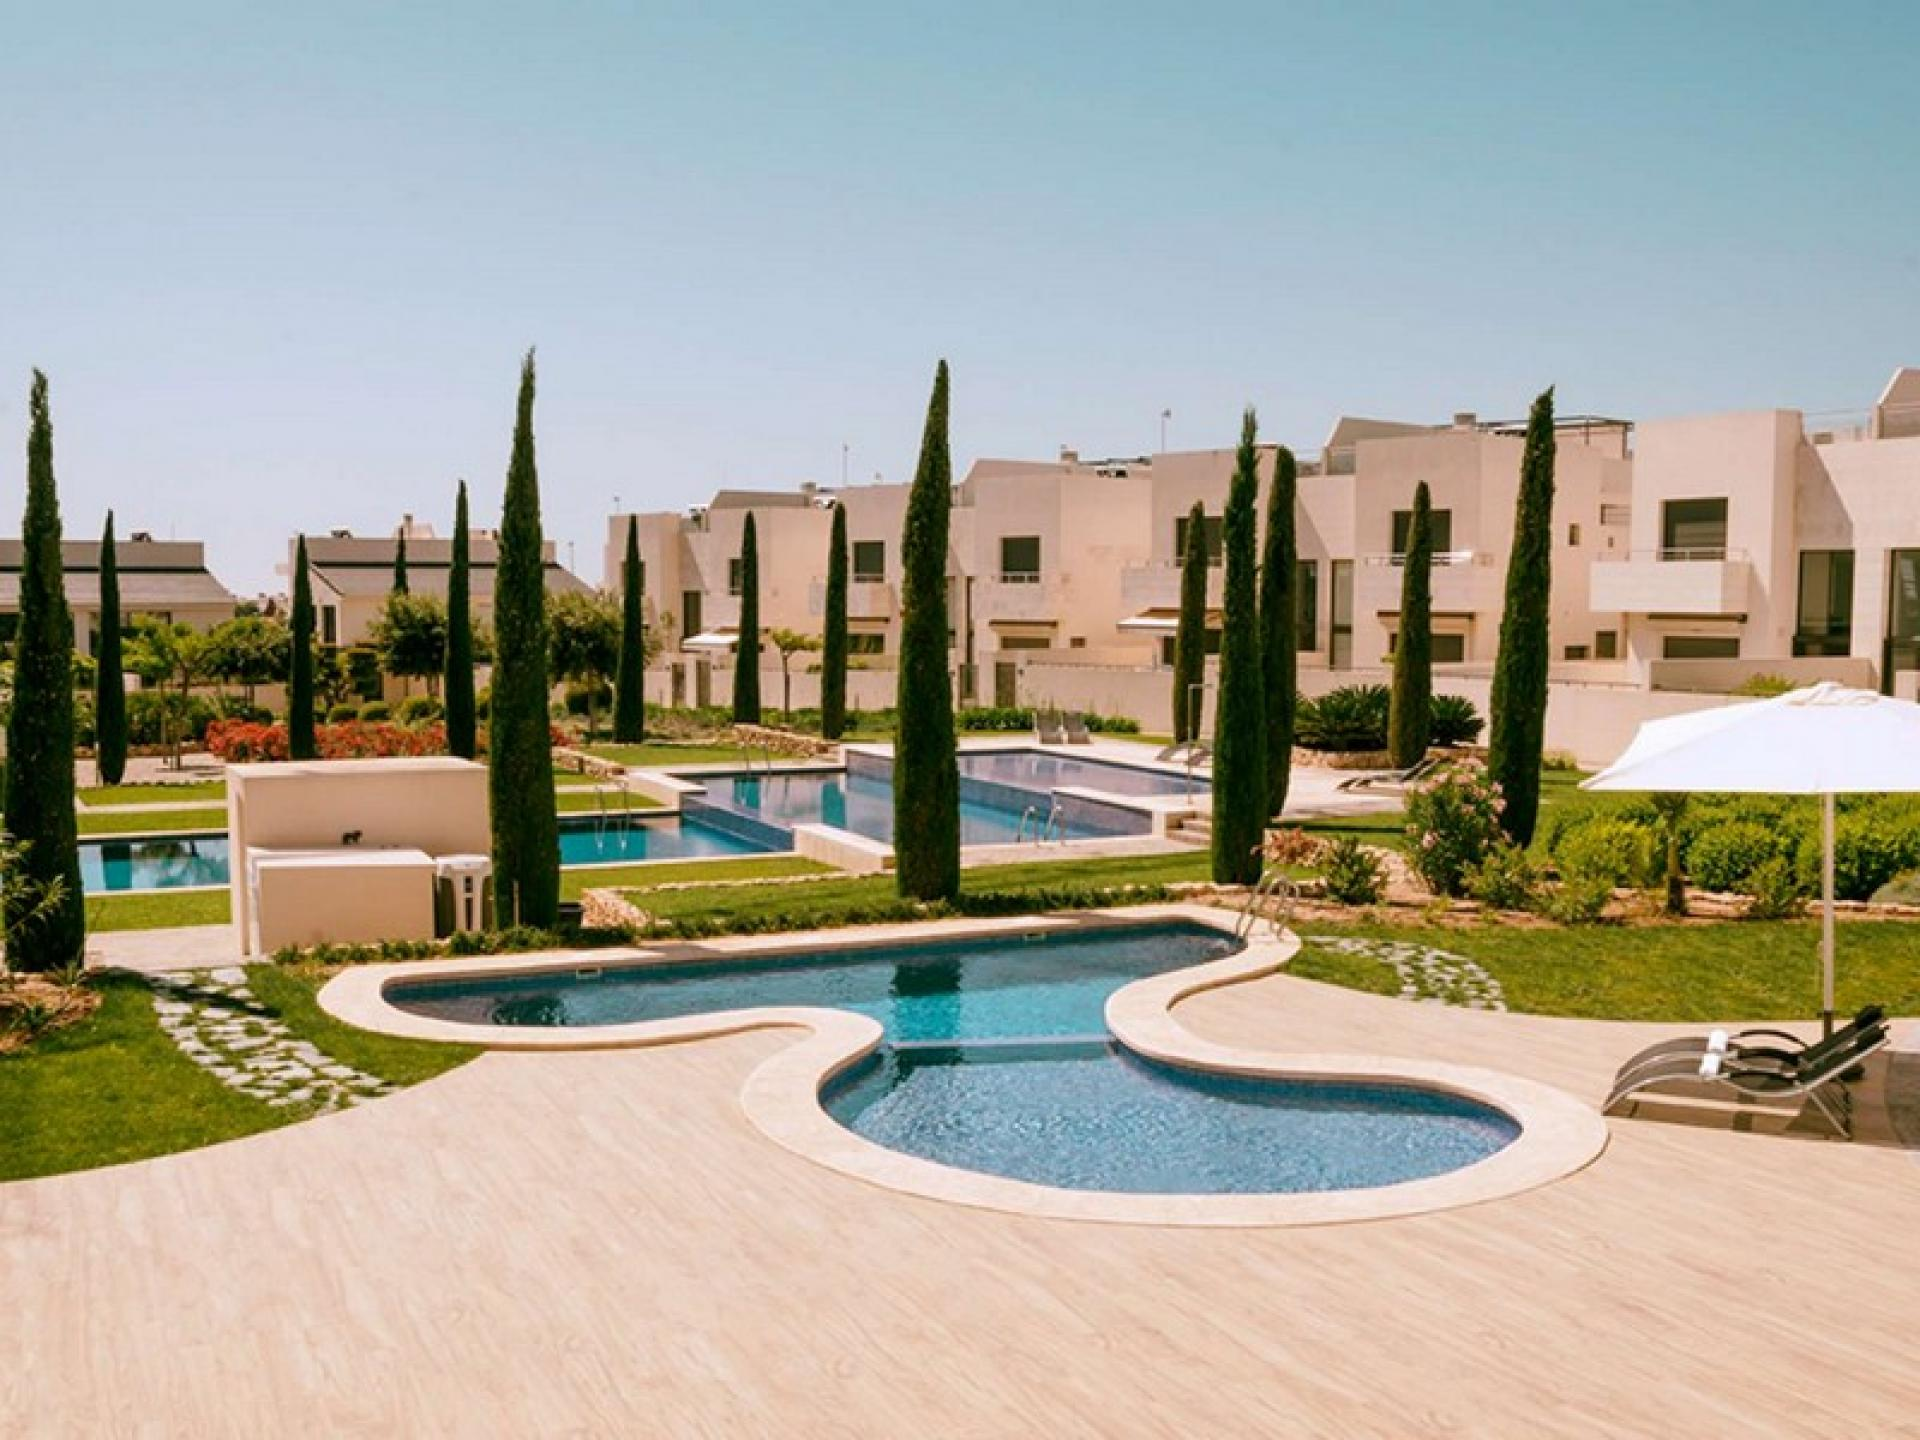 Jardines de Montesolana - La Zenia